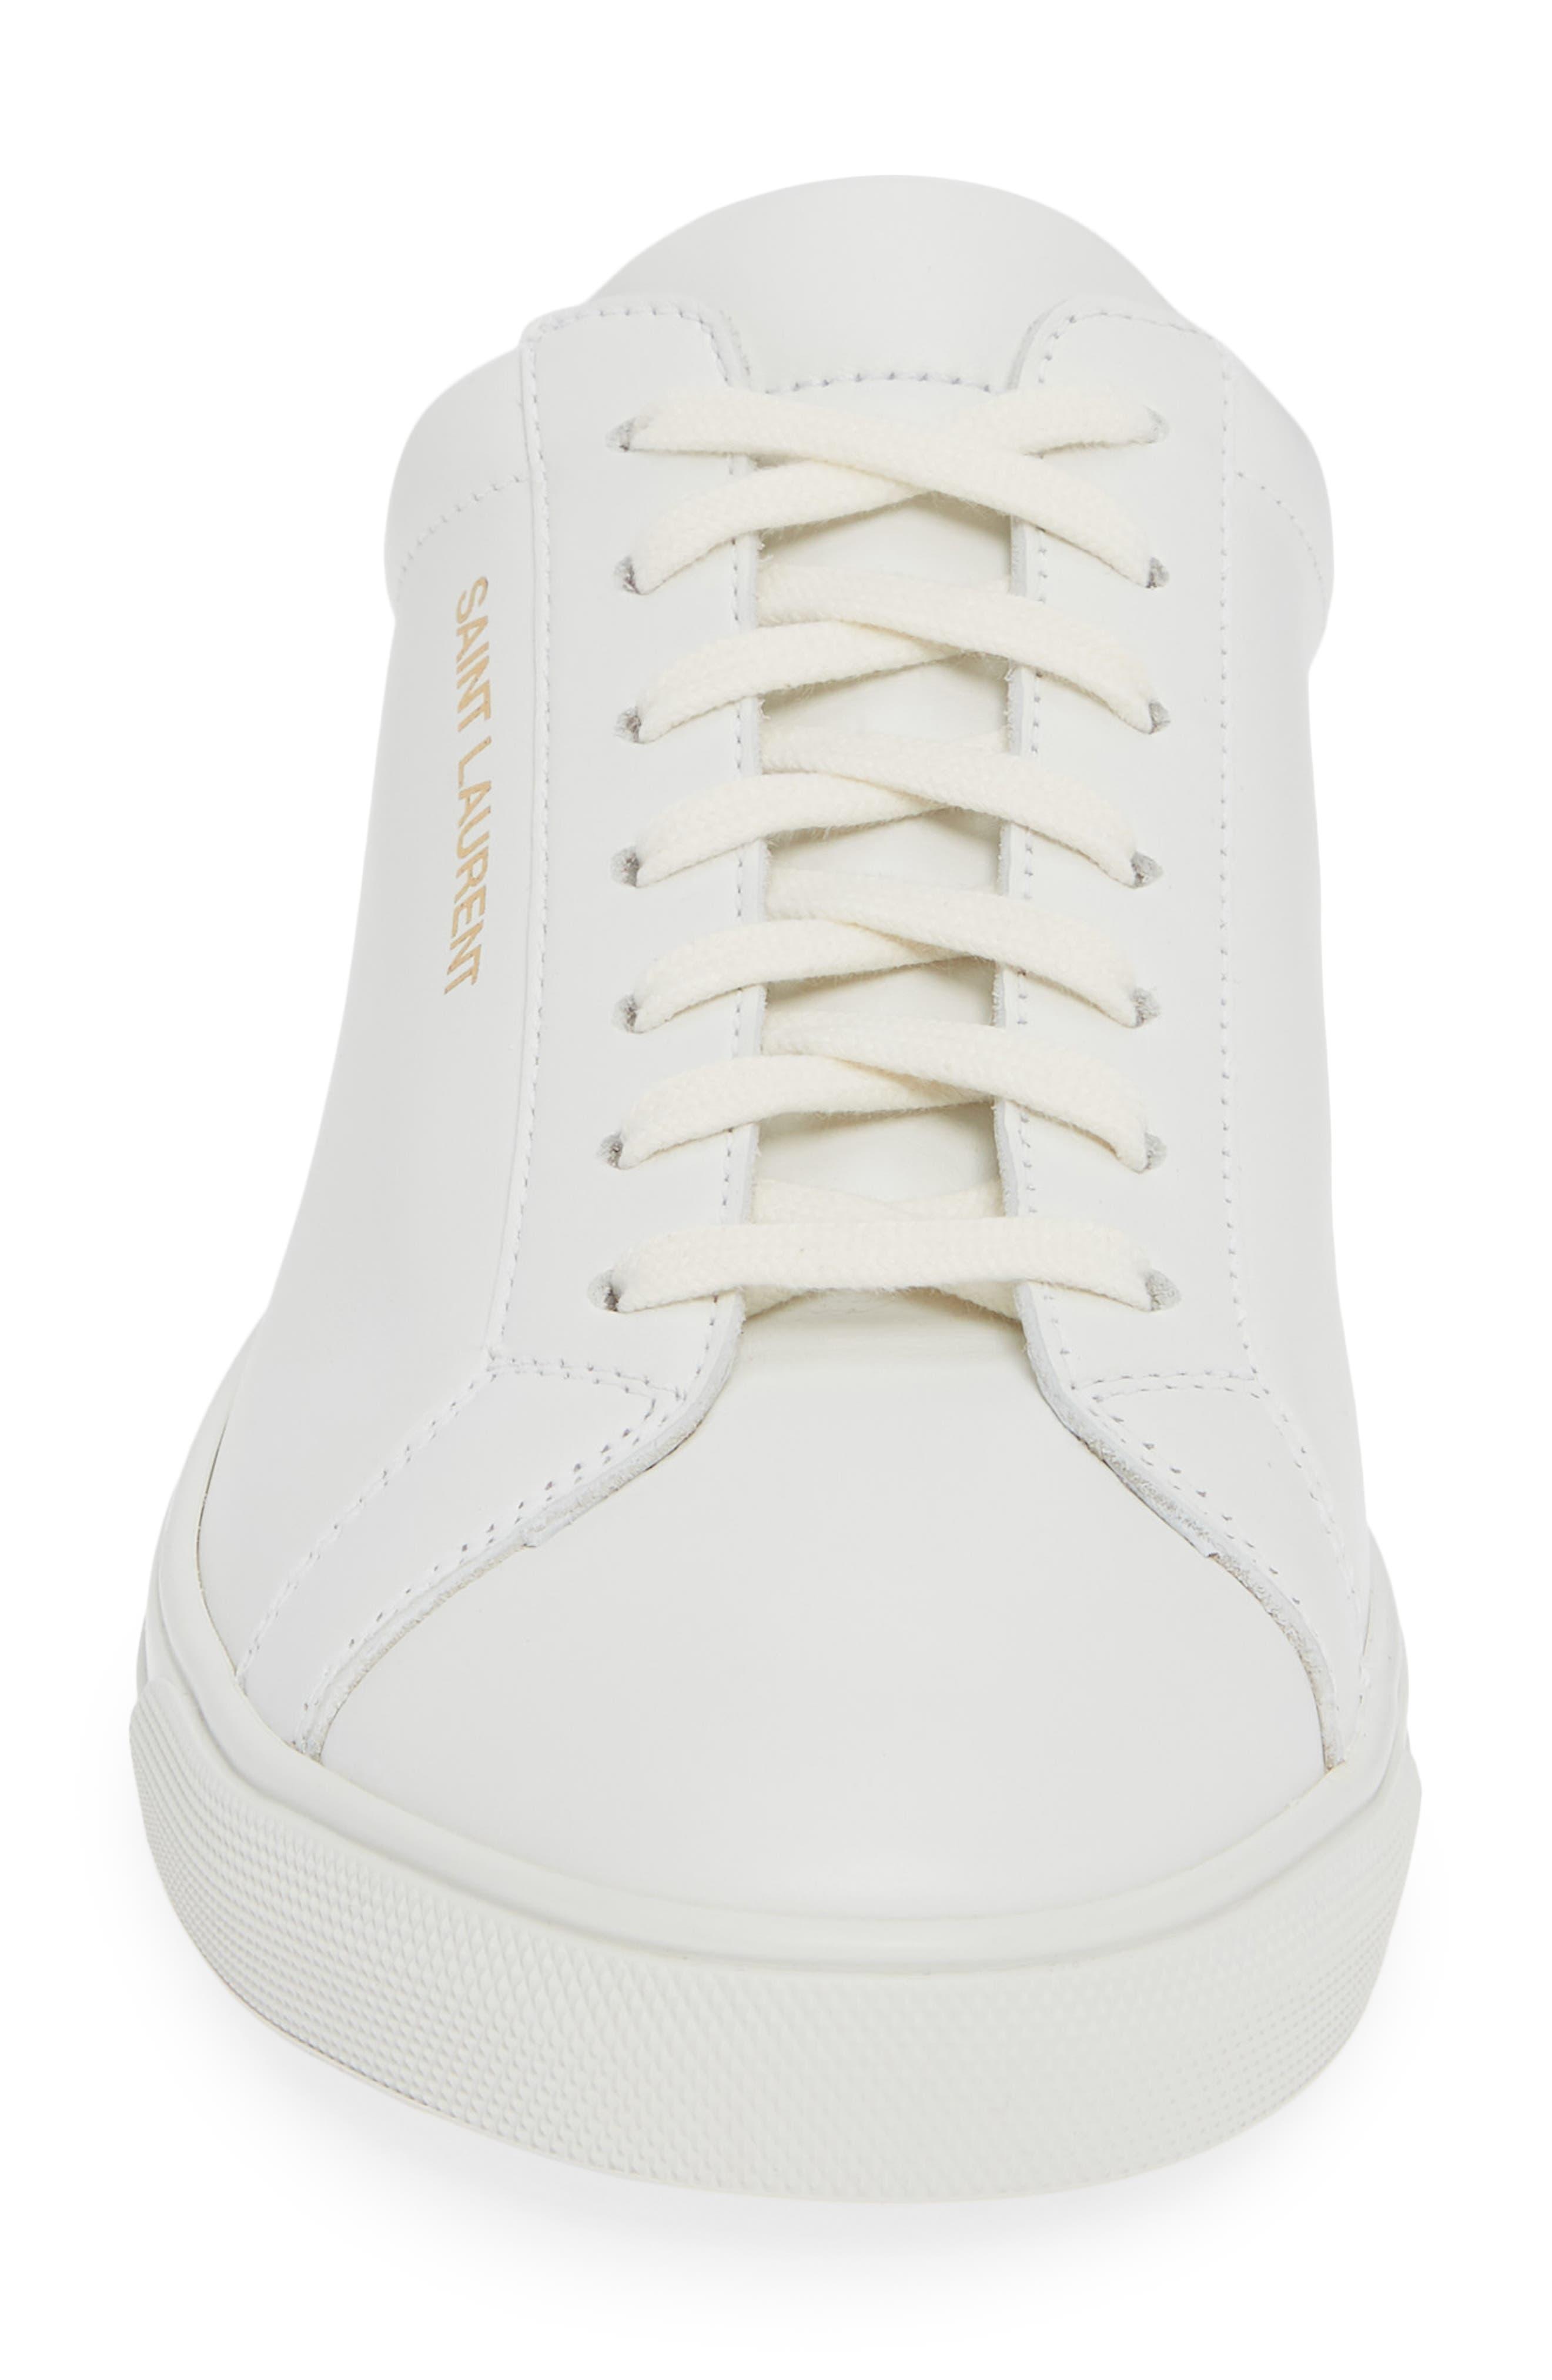 Andy Low Top Sneaker,                             Alternate thumbnail 4, color,                             BLANC OPTIQUE